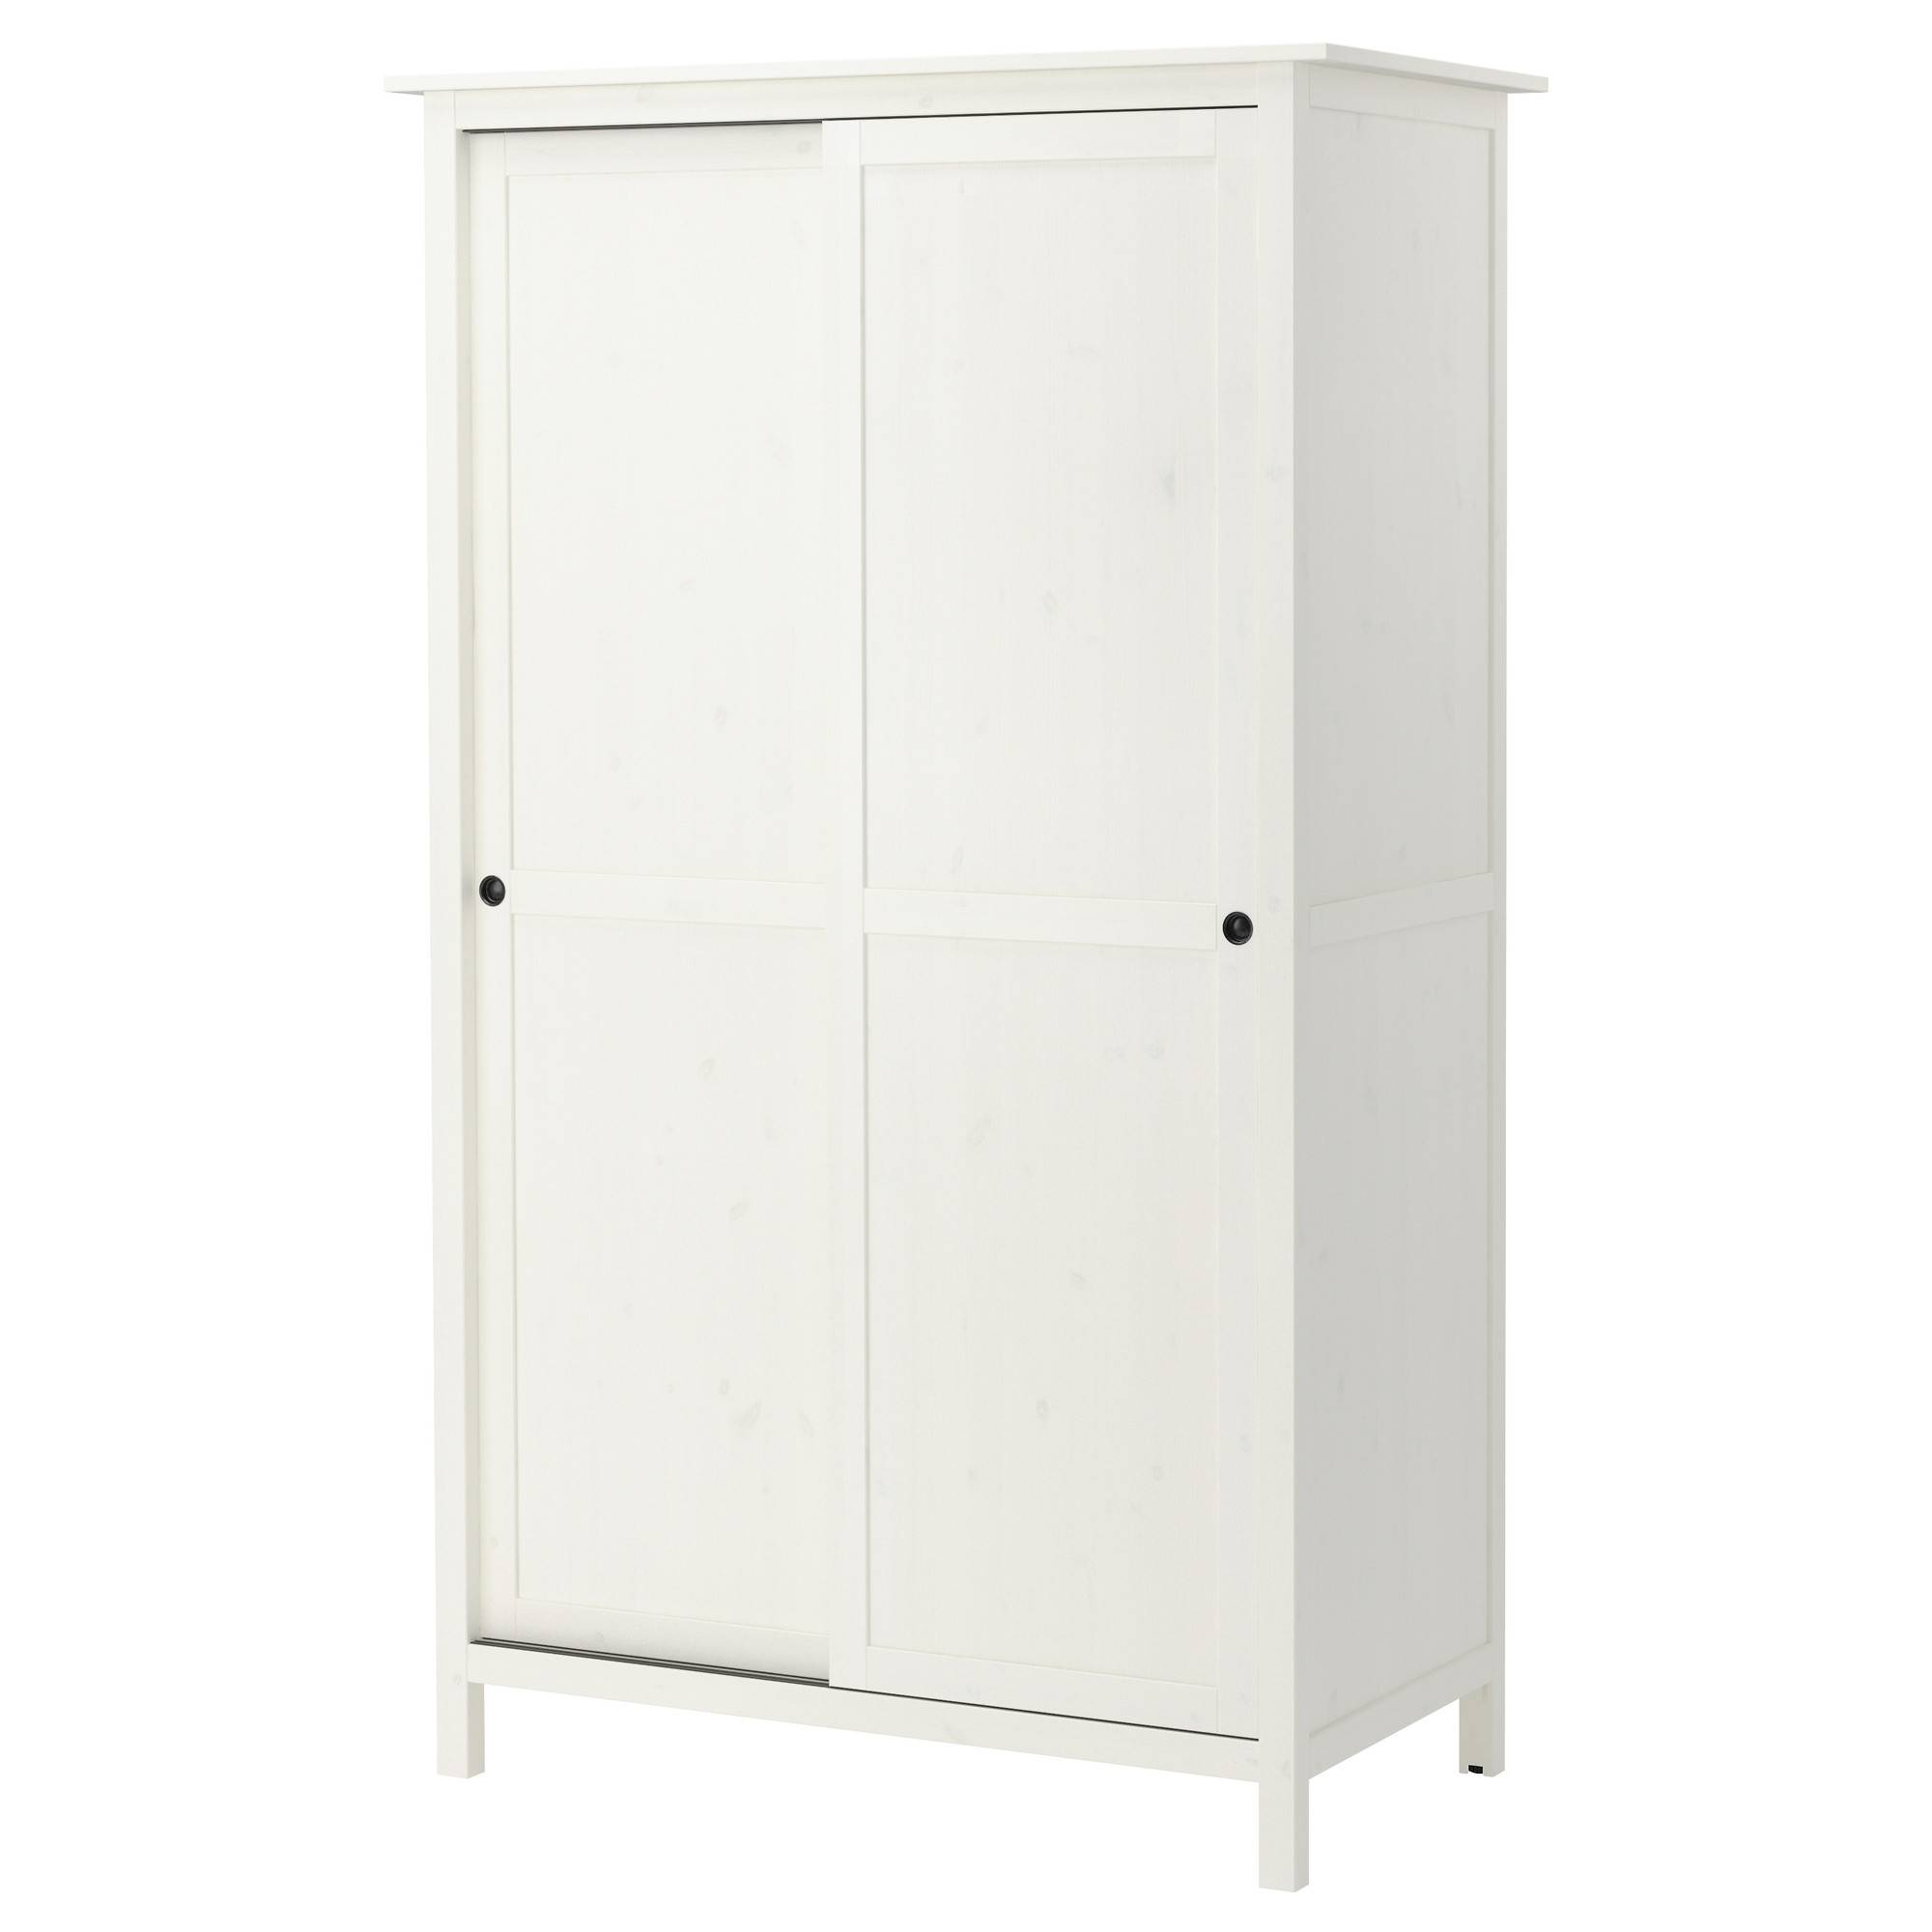 Wardrobes | Ikea For Black Single Door Wardrobes (View 5 of 15)